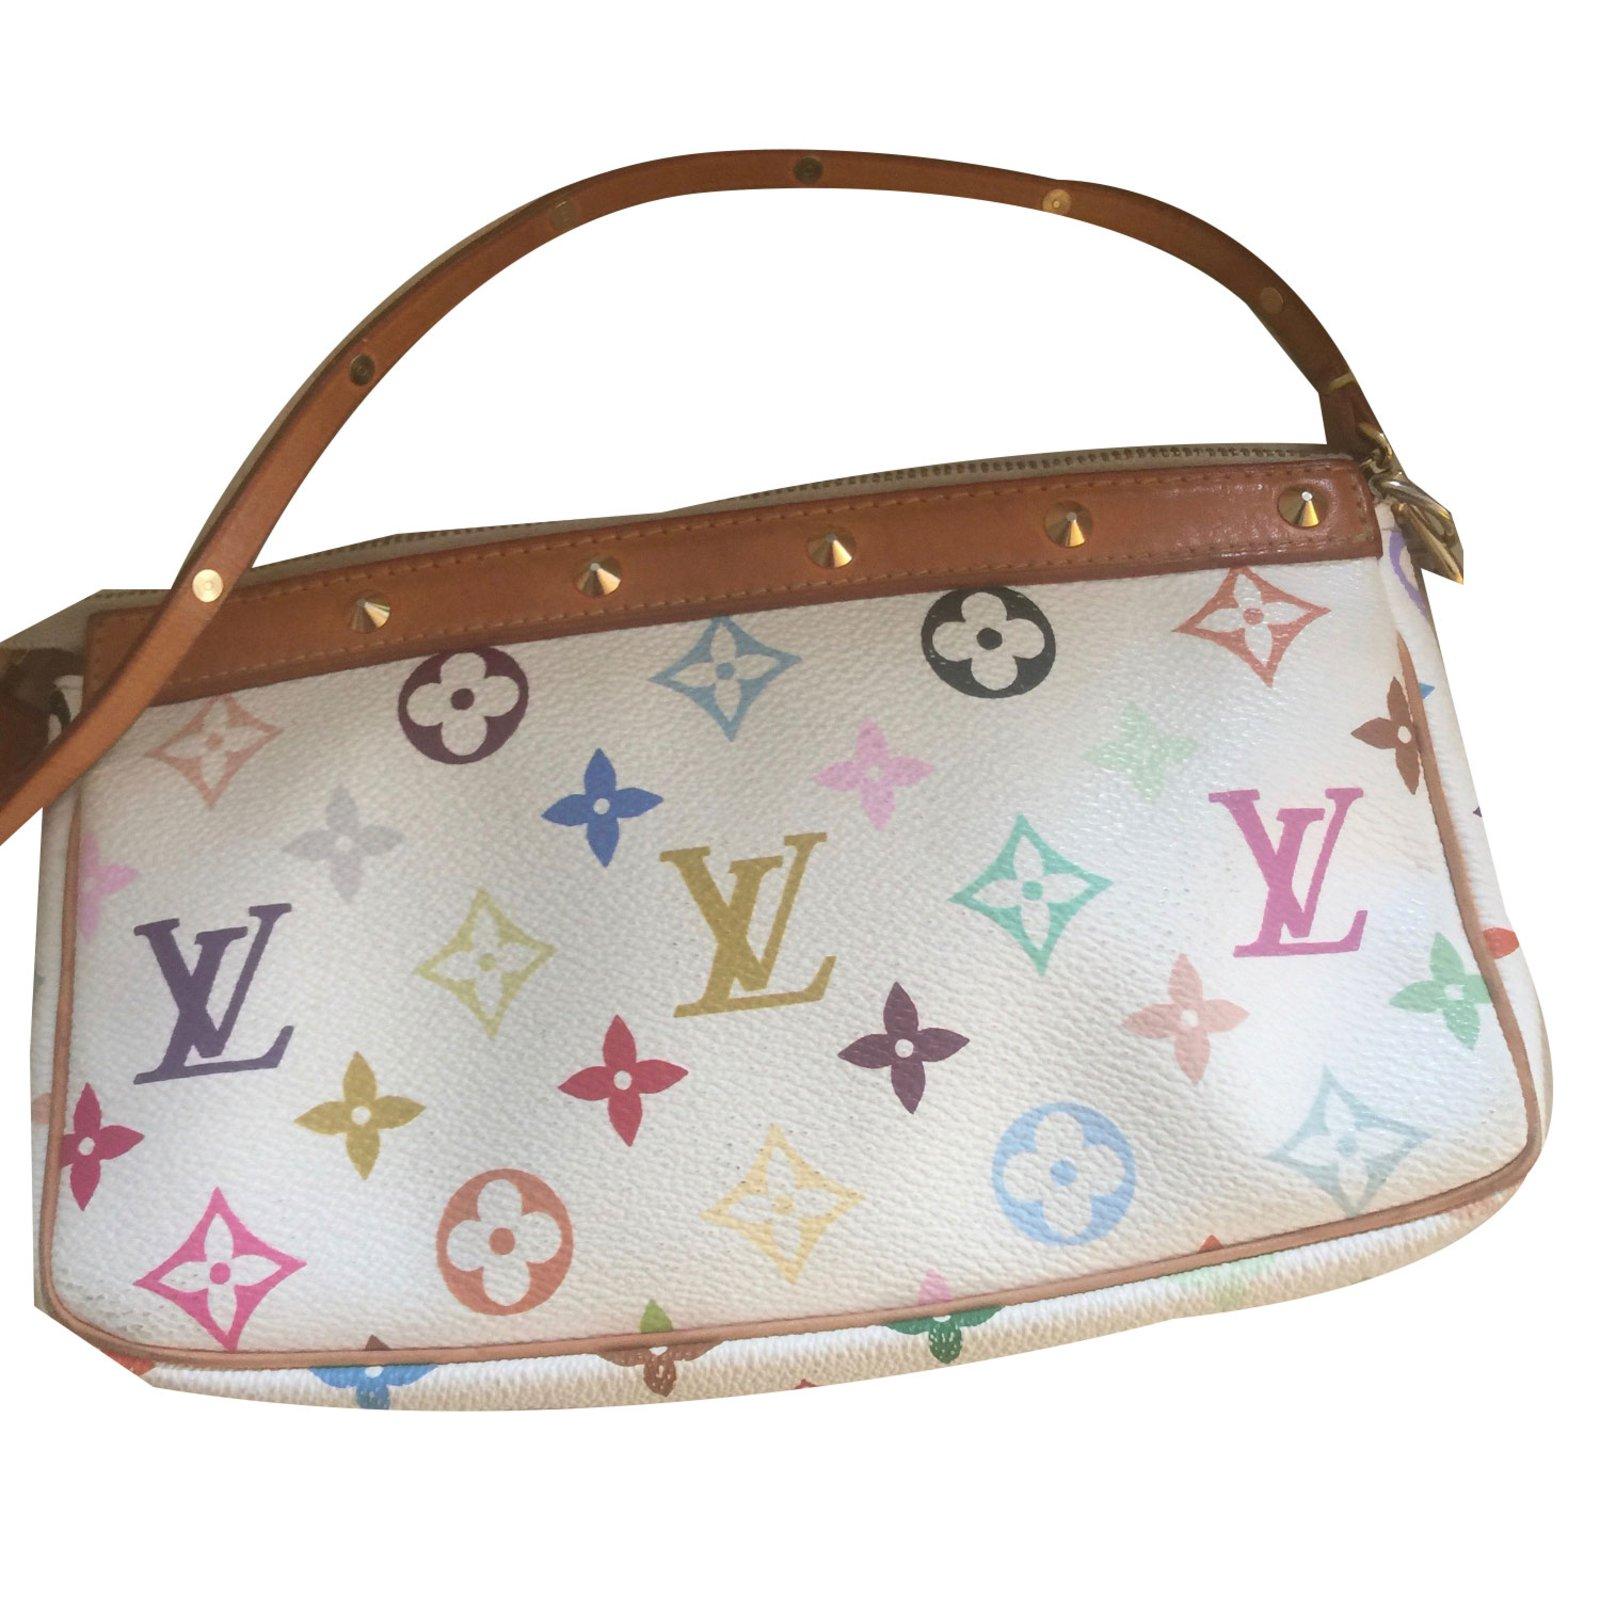 8dad81996 Louis Vuitton Clutch Bags Leather White Ref 48136 Joli